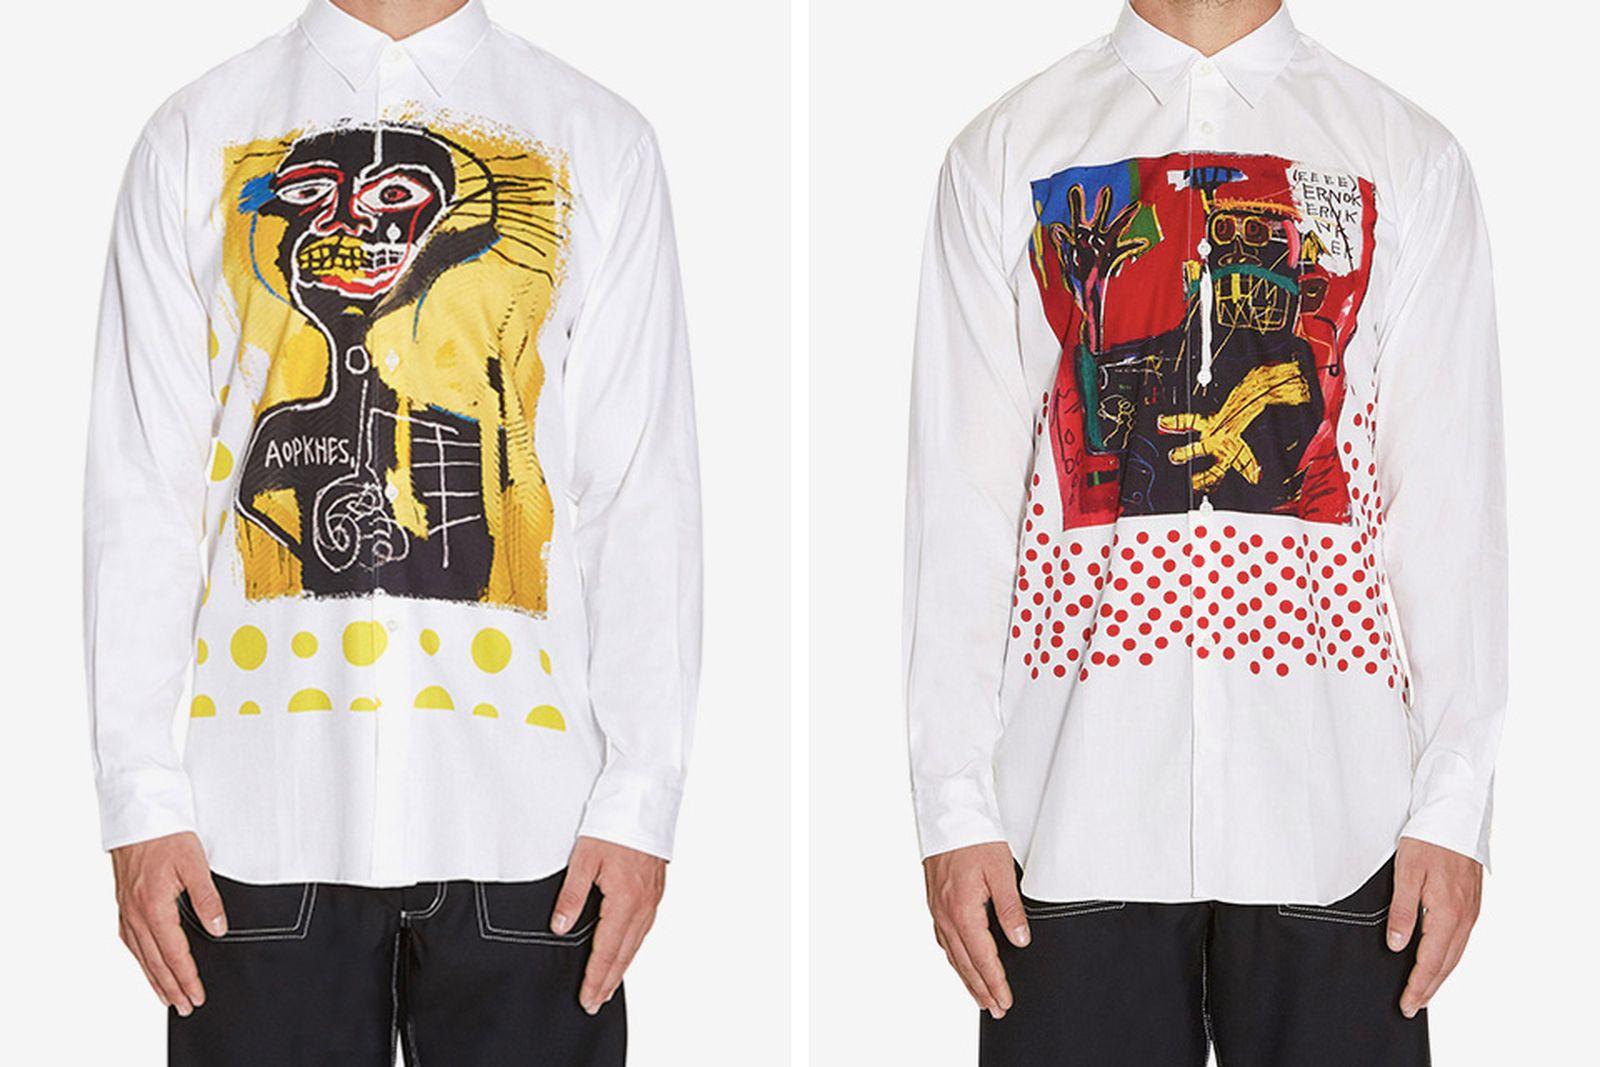 basquiat cdg main Jean-Michel Basquiat Estate comme des garcons shirt jean michel basquiat